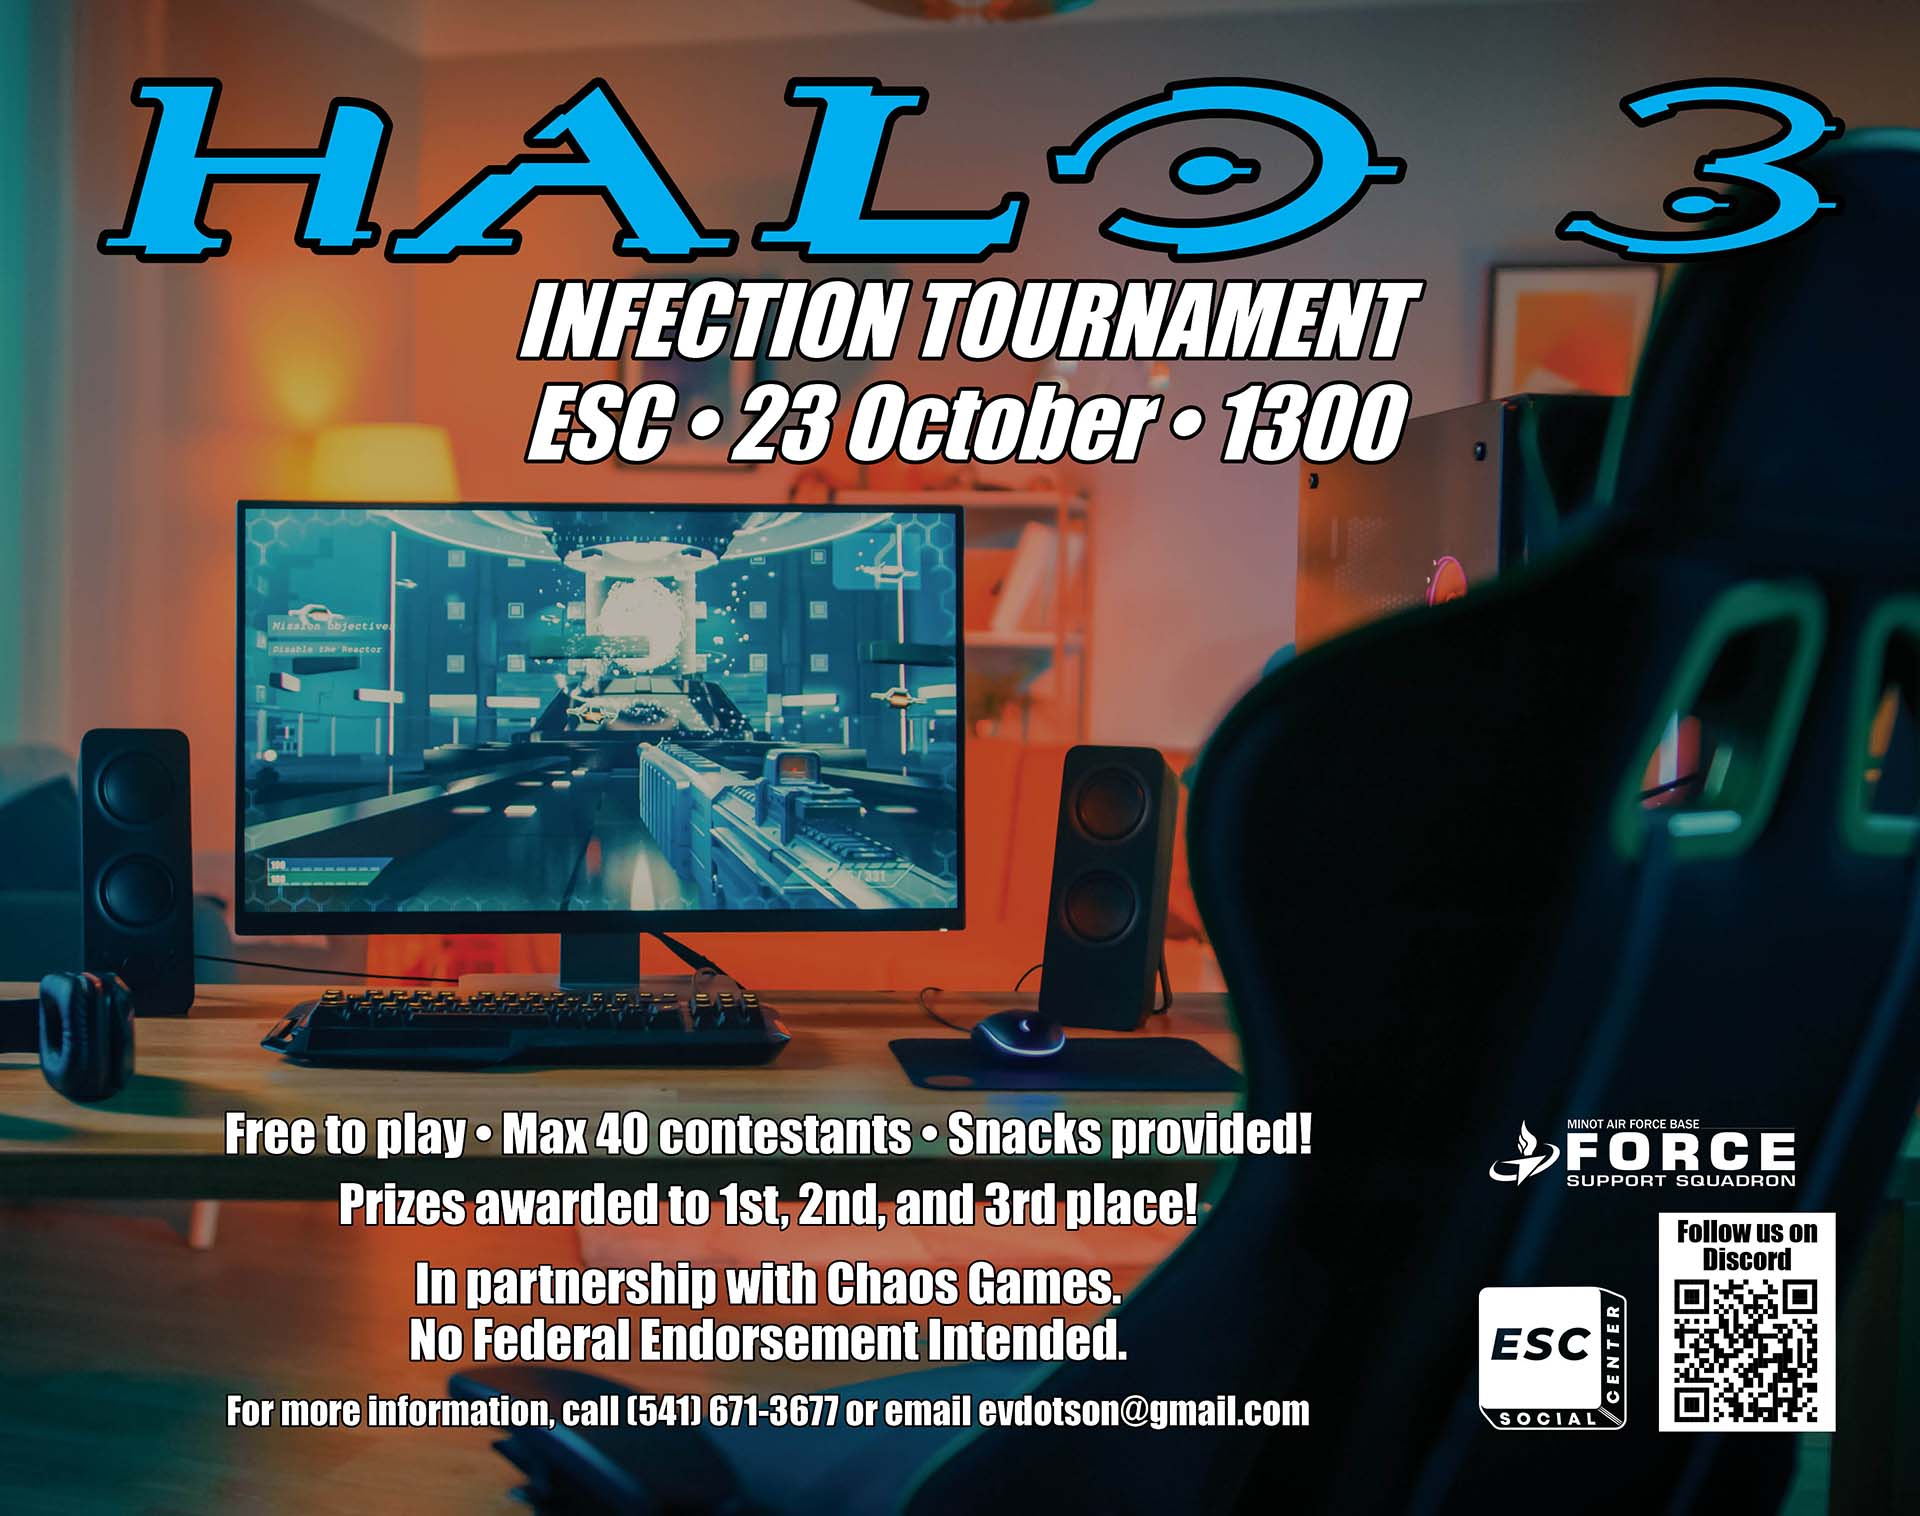 10.23 Halo 3 Infection Tournament